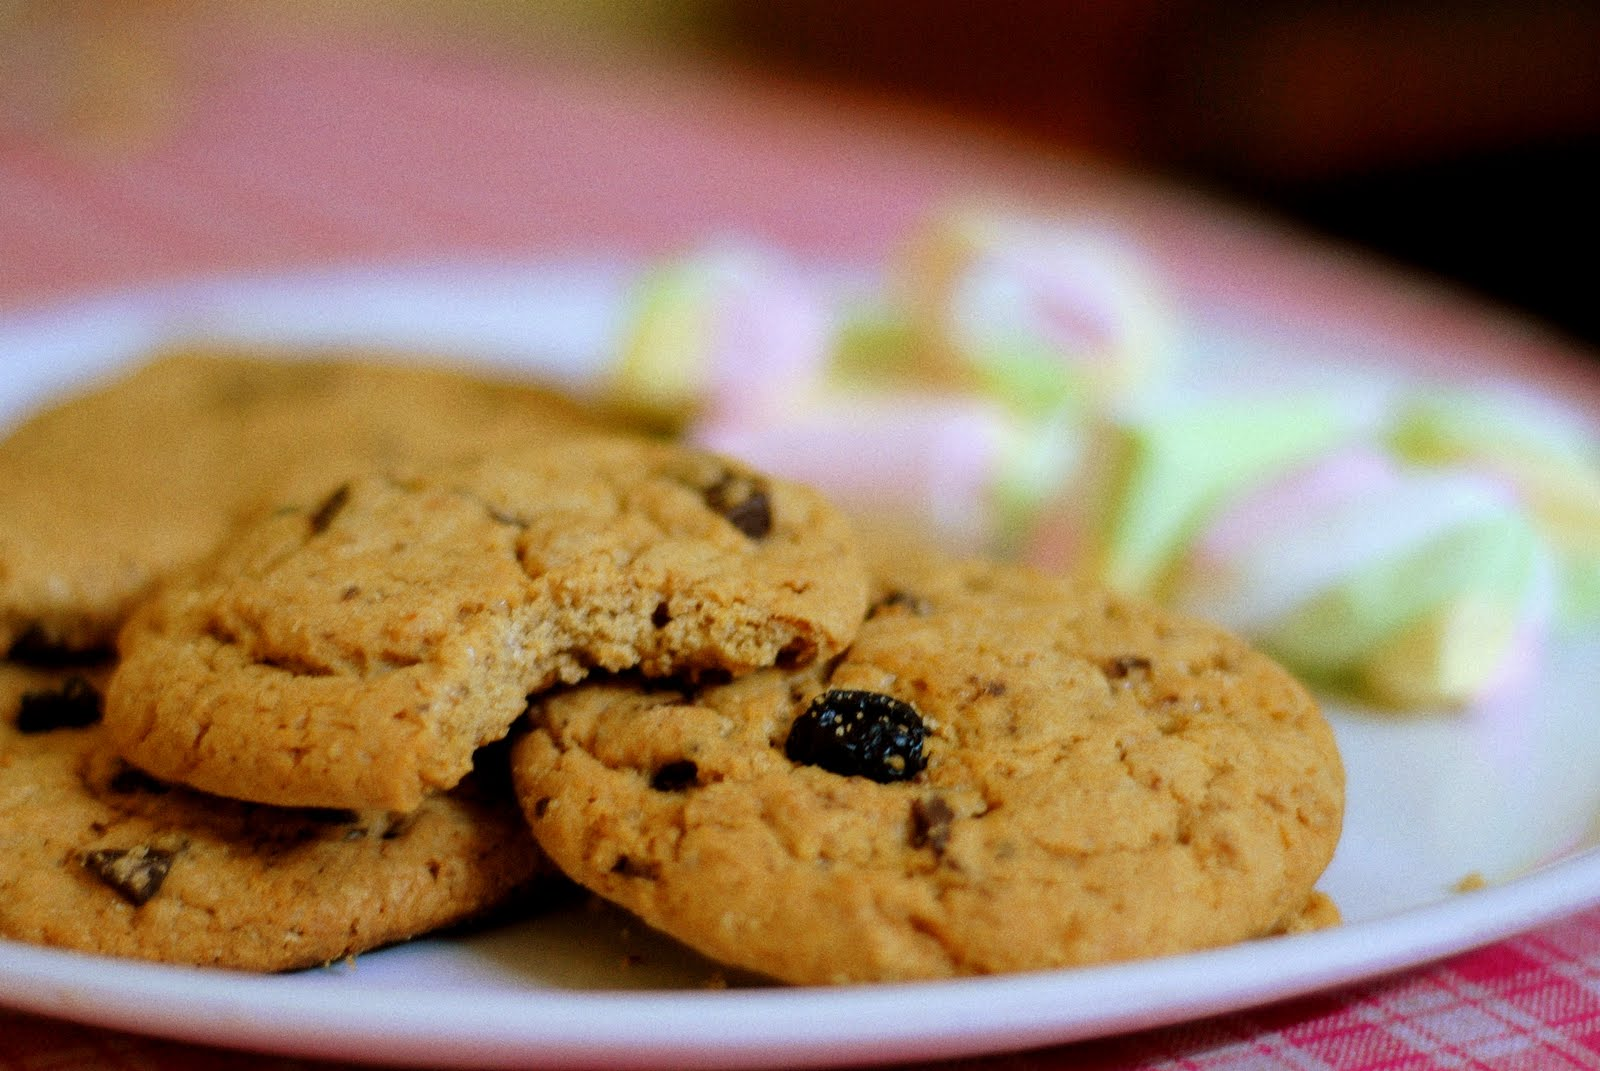 Purple Cinnamon and Salt: Chocolate chunk blueberry cookies